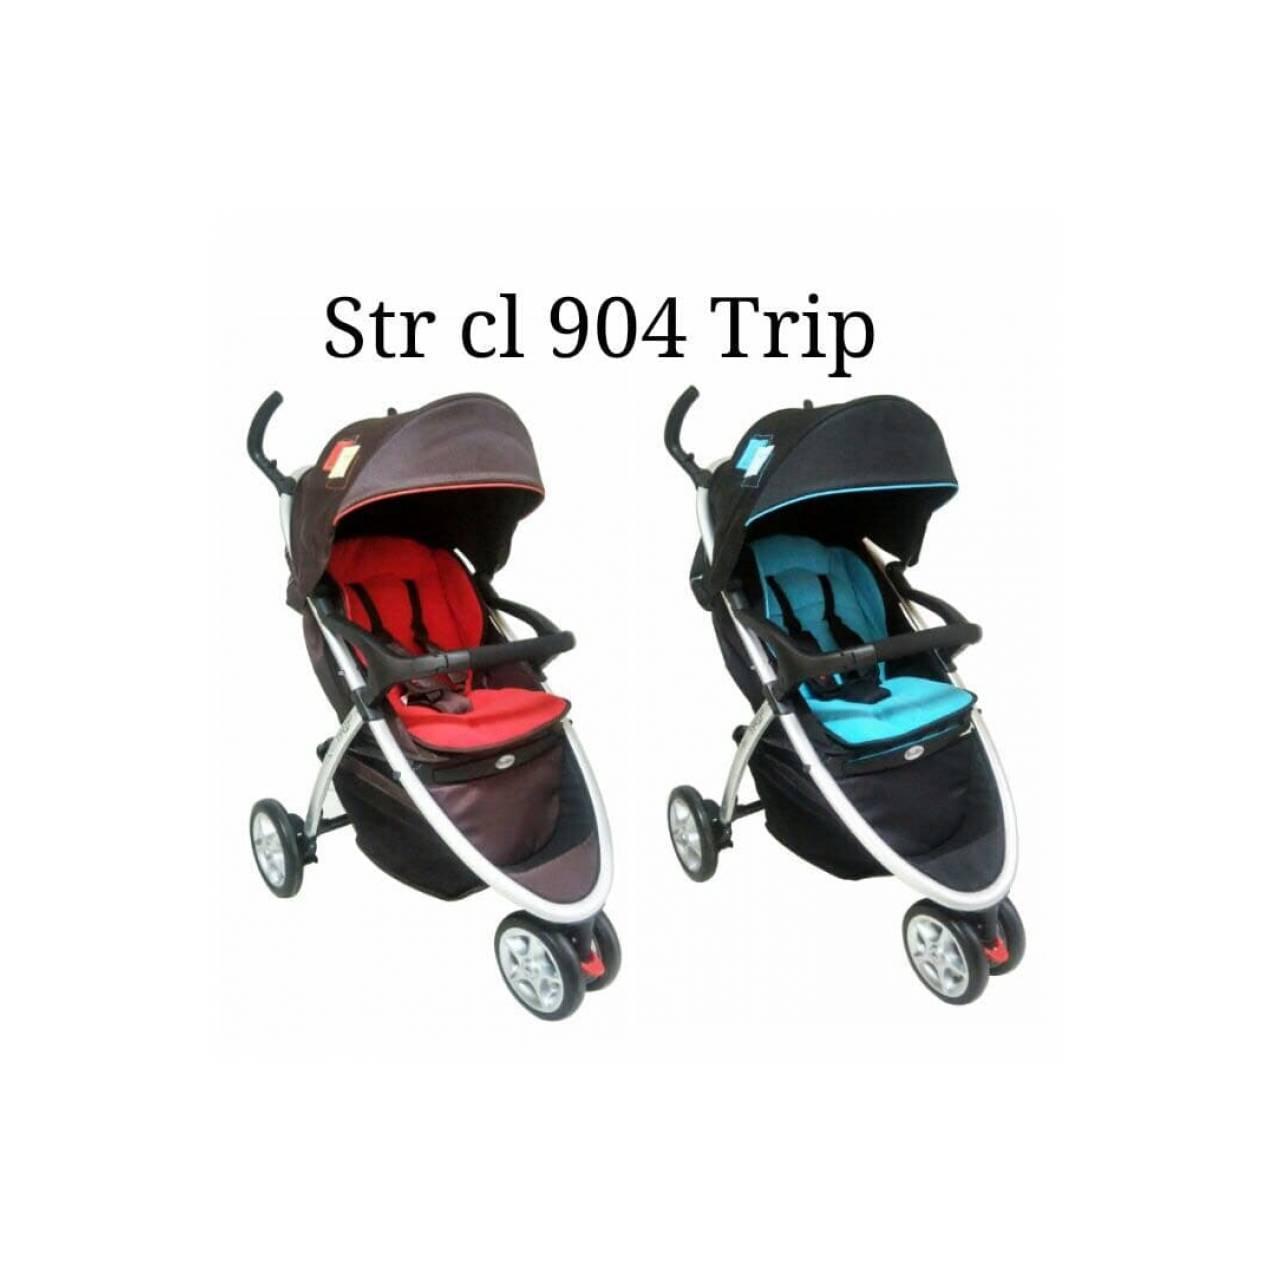 Stroller Cocolatte Trip CL 904 kereta bayi